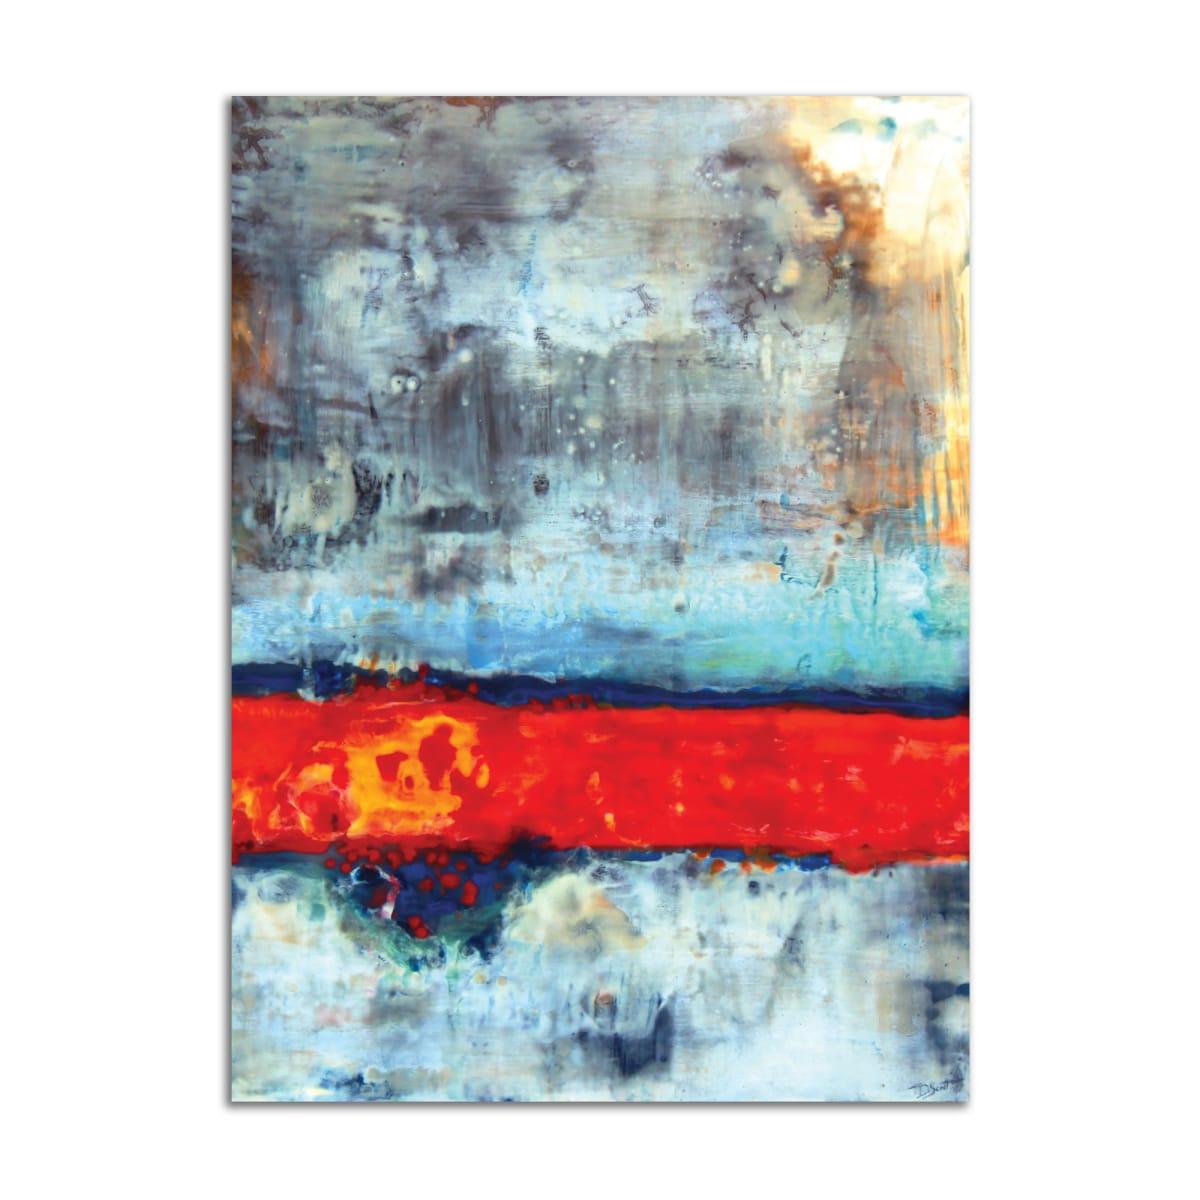 Fire River by T.D. Scott